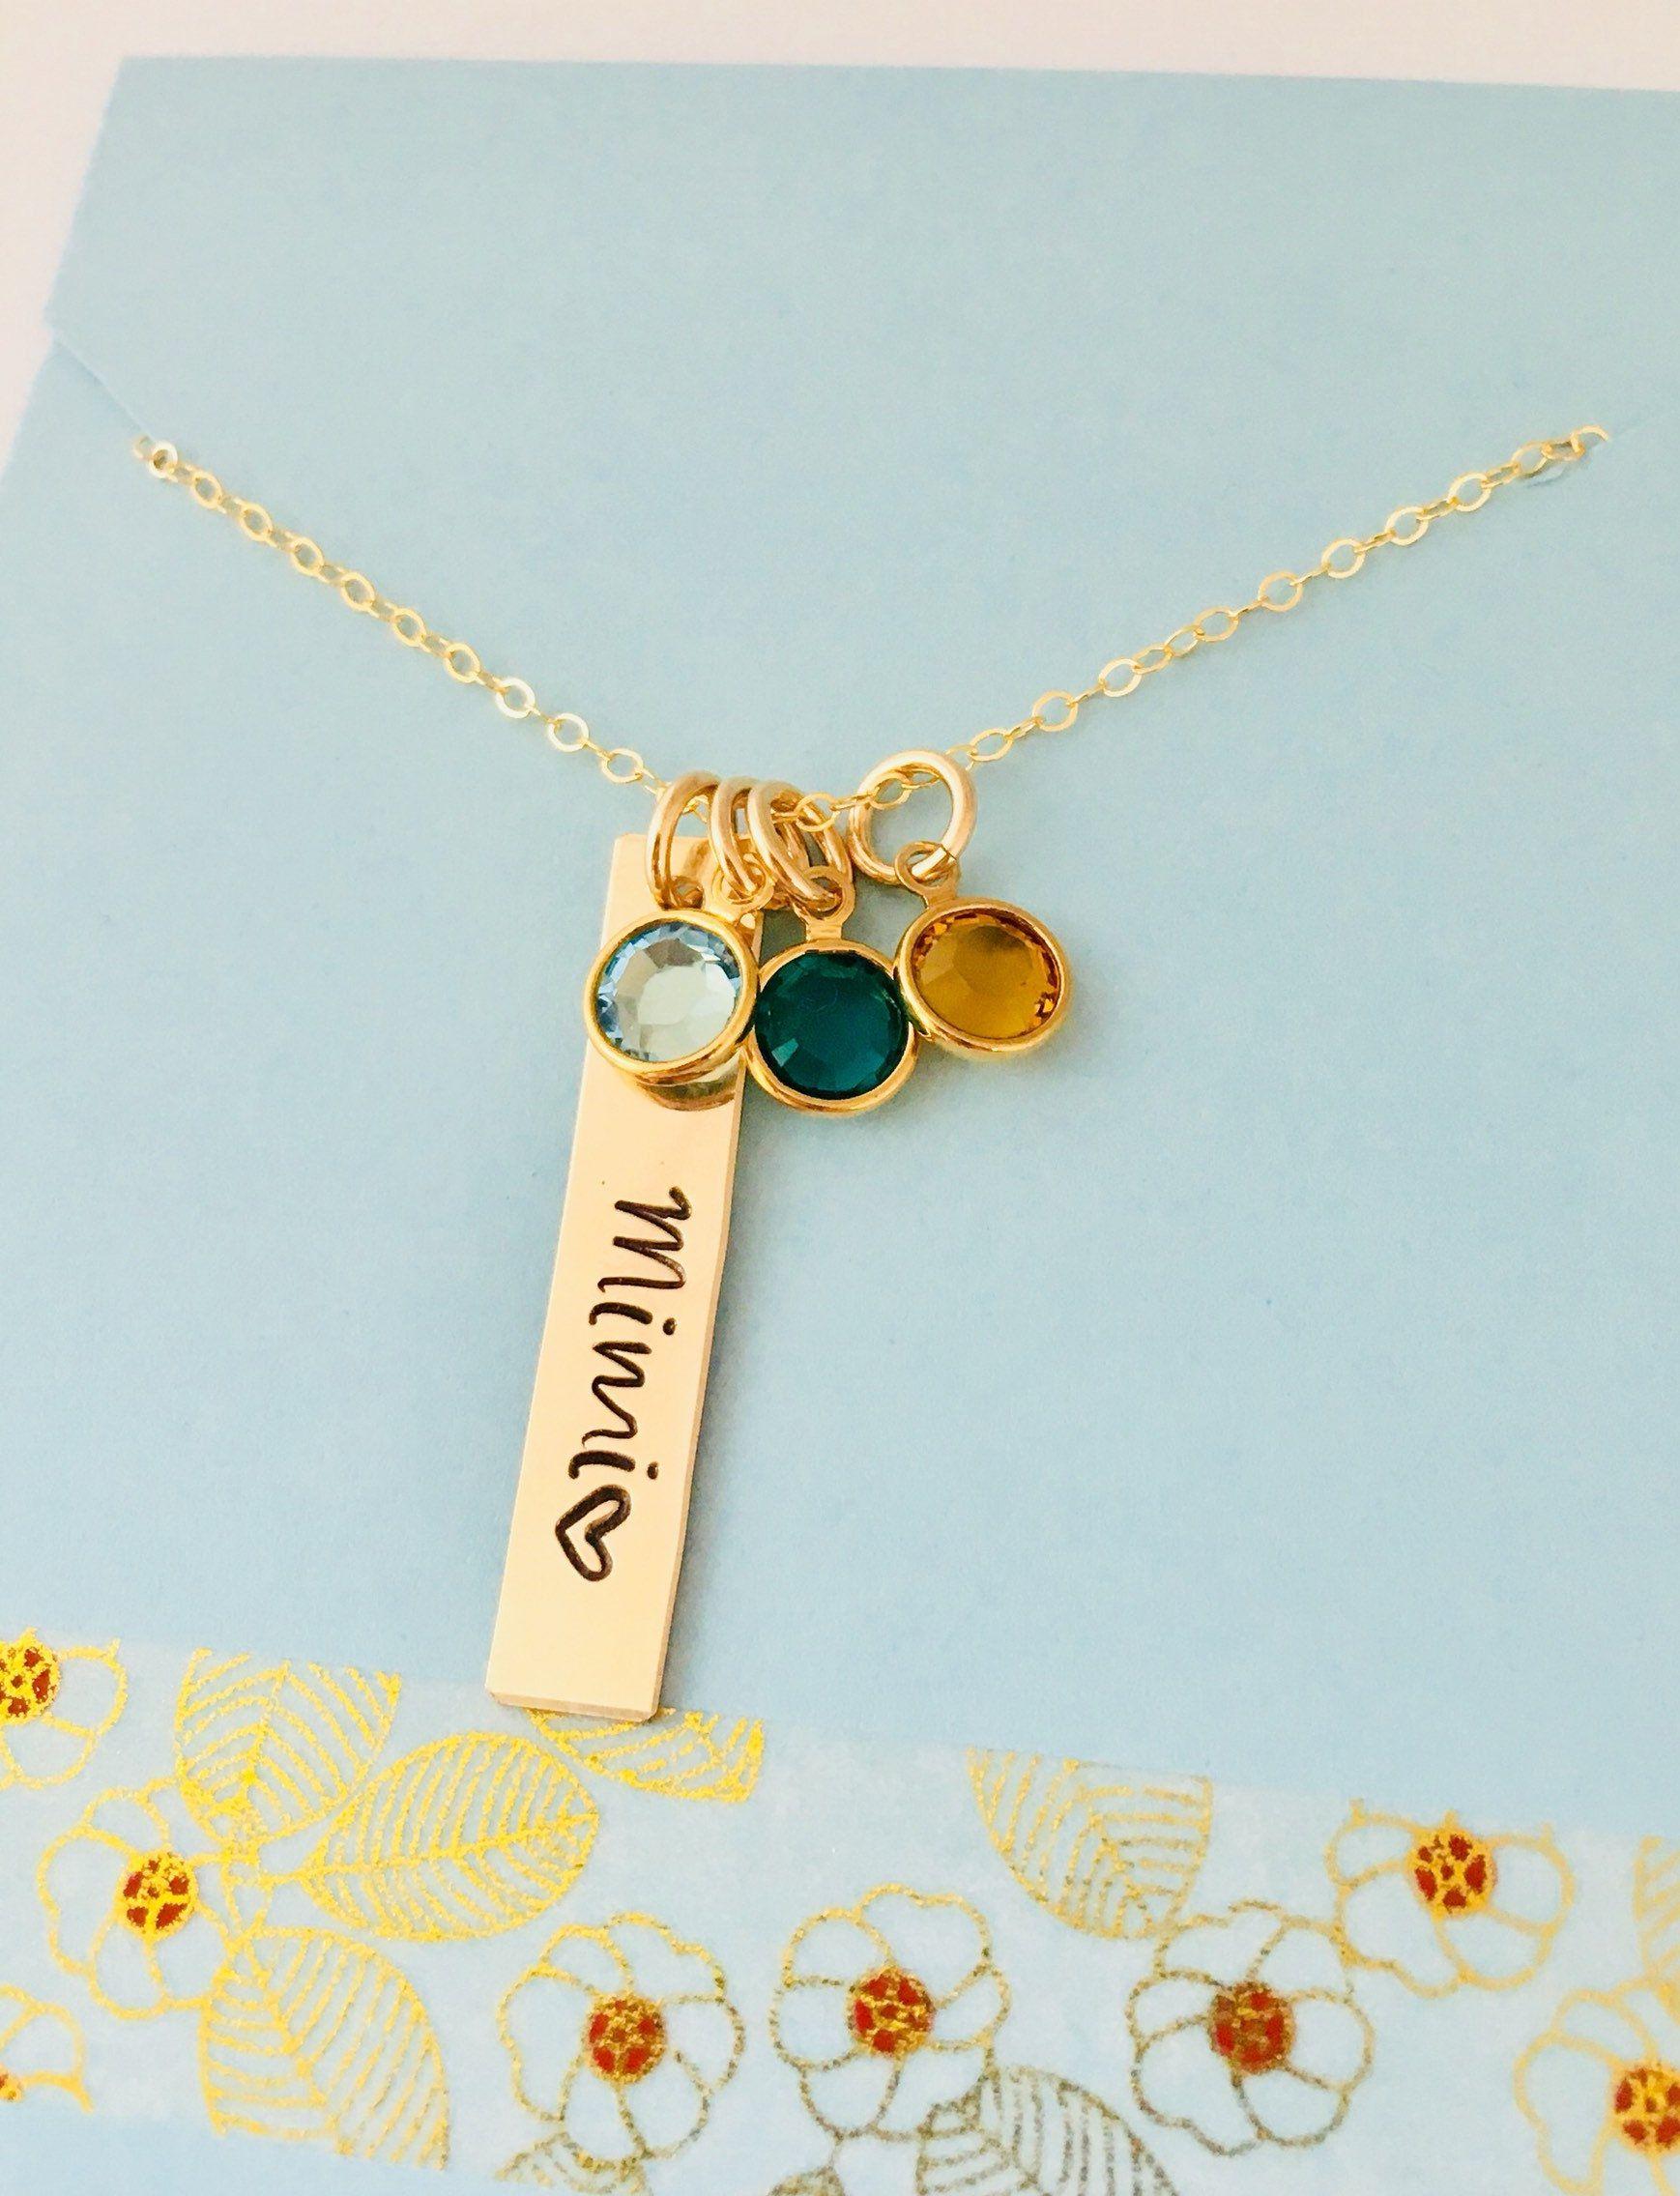 Gold Mimi Necklace Personalized Grandma Birthstone Necklace 14k Gold Filled Grandma Grandma Necklace Birthstone Grandma Jewelry Personalized Grandma Necklace